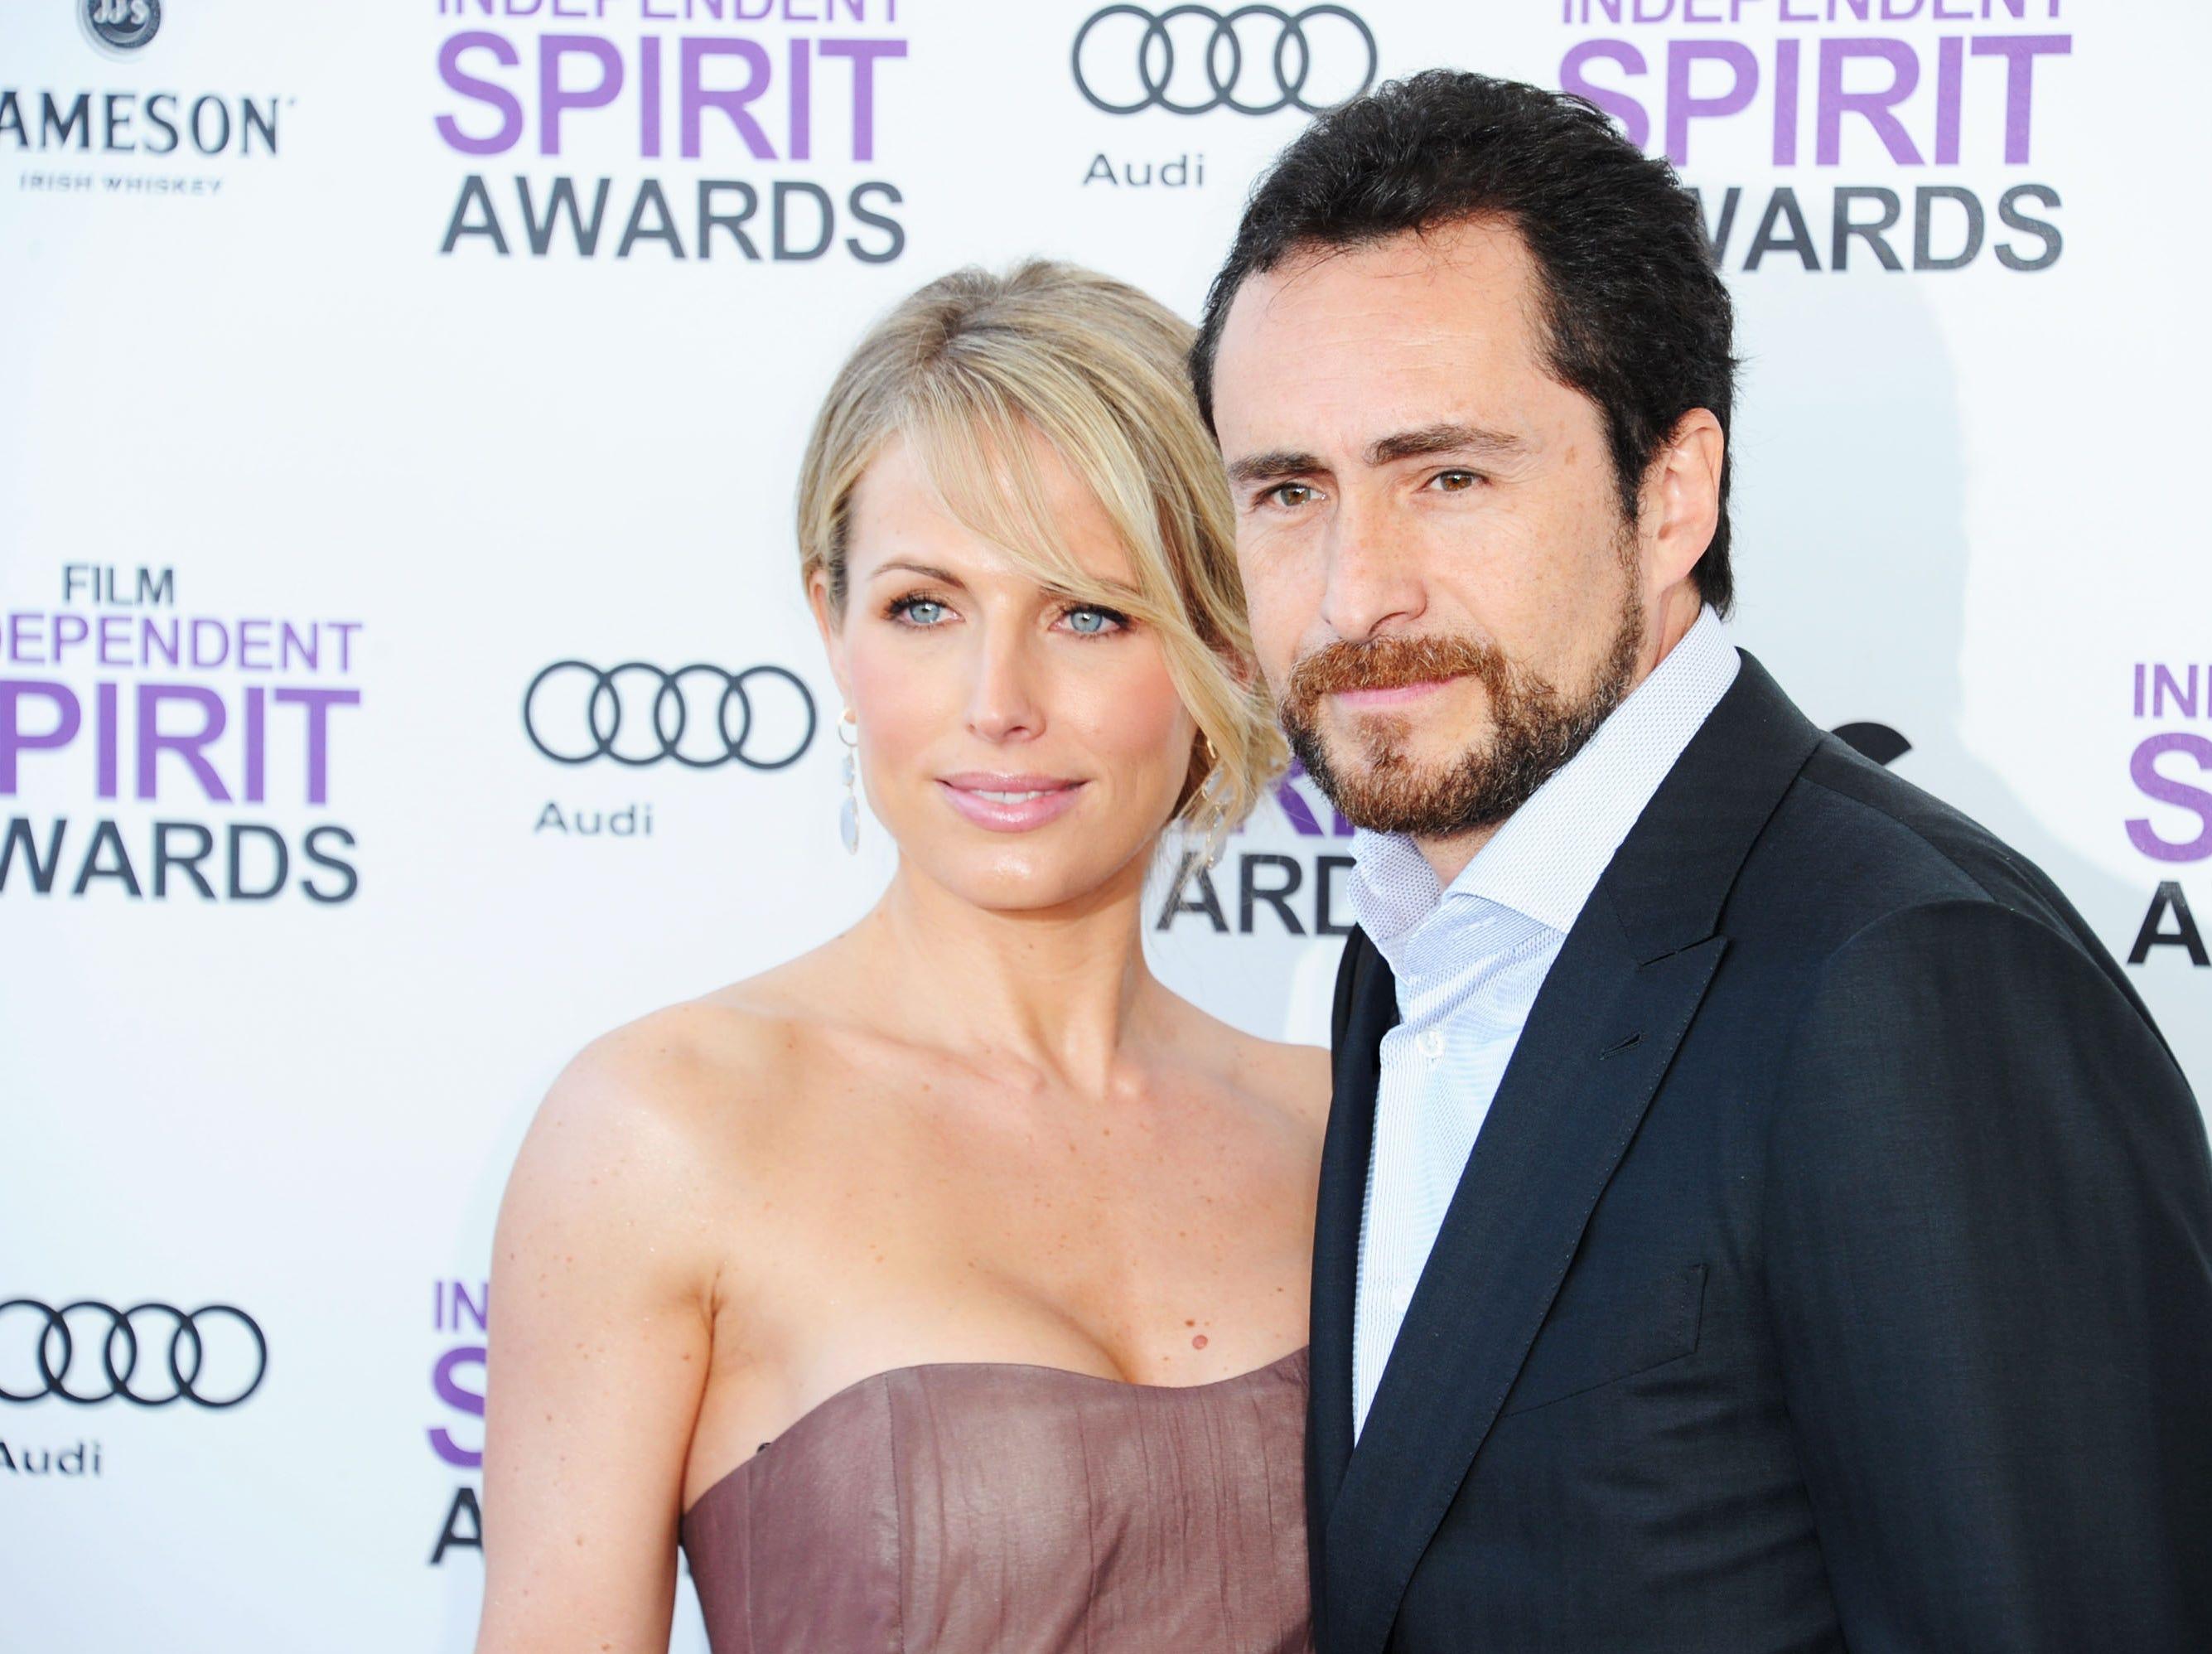 Demian Bichir and Stefanie Sherk arrive at the Film Independent Spirit Awards on Feb. 25, 2012, in Santa Monica, California.